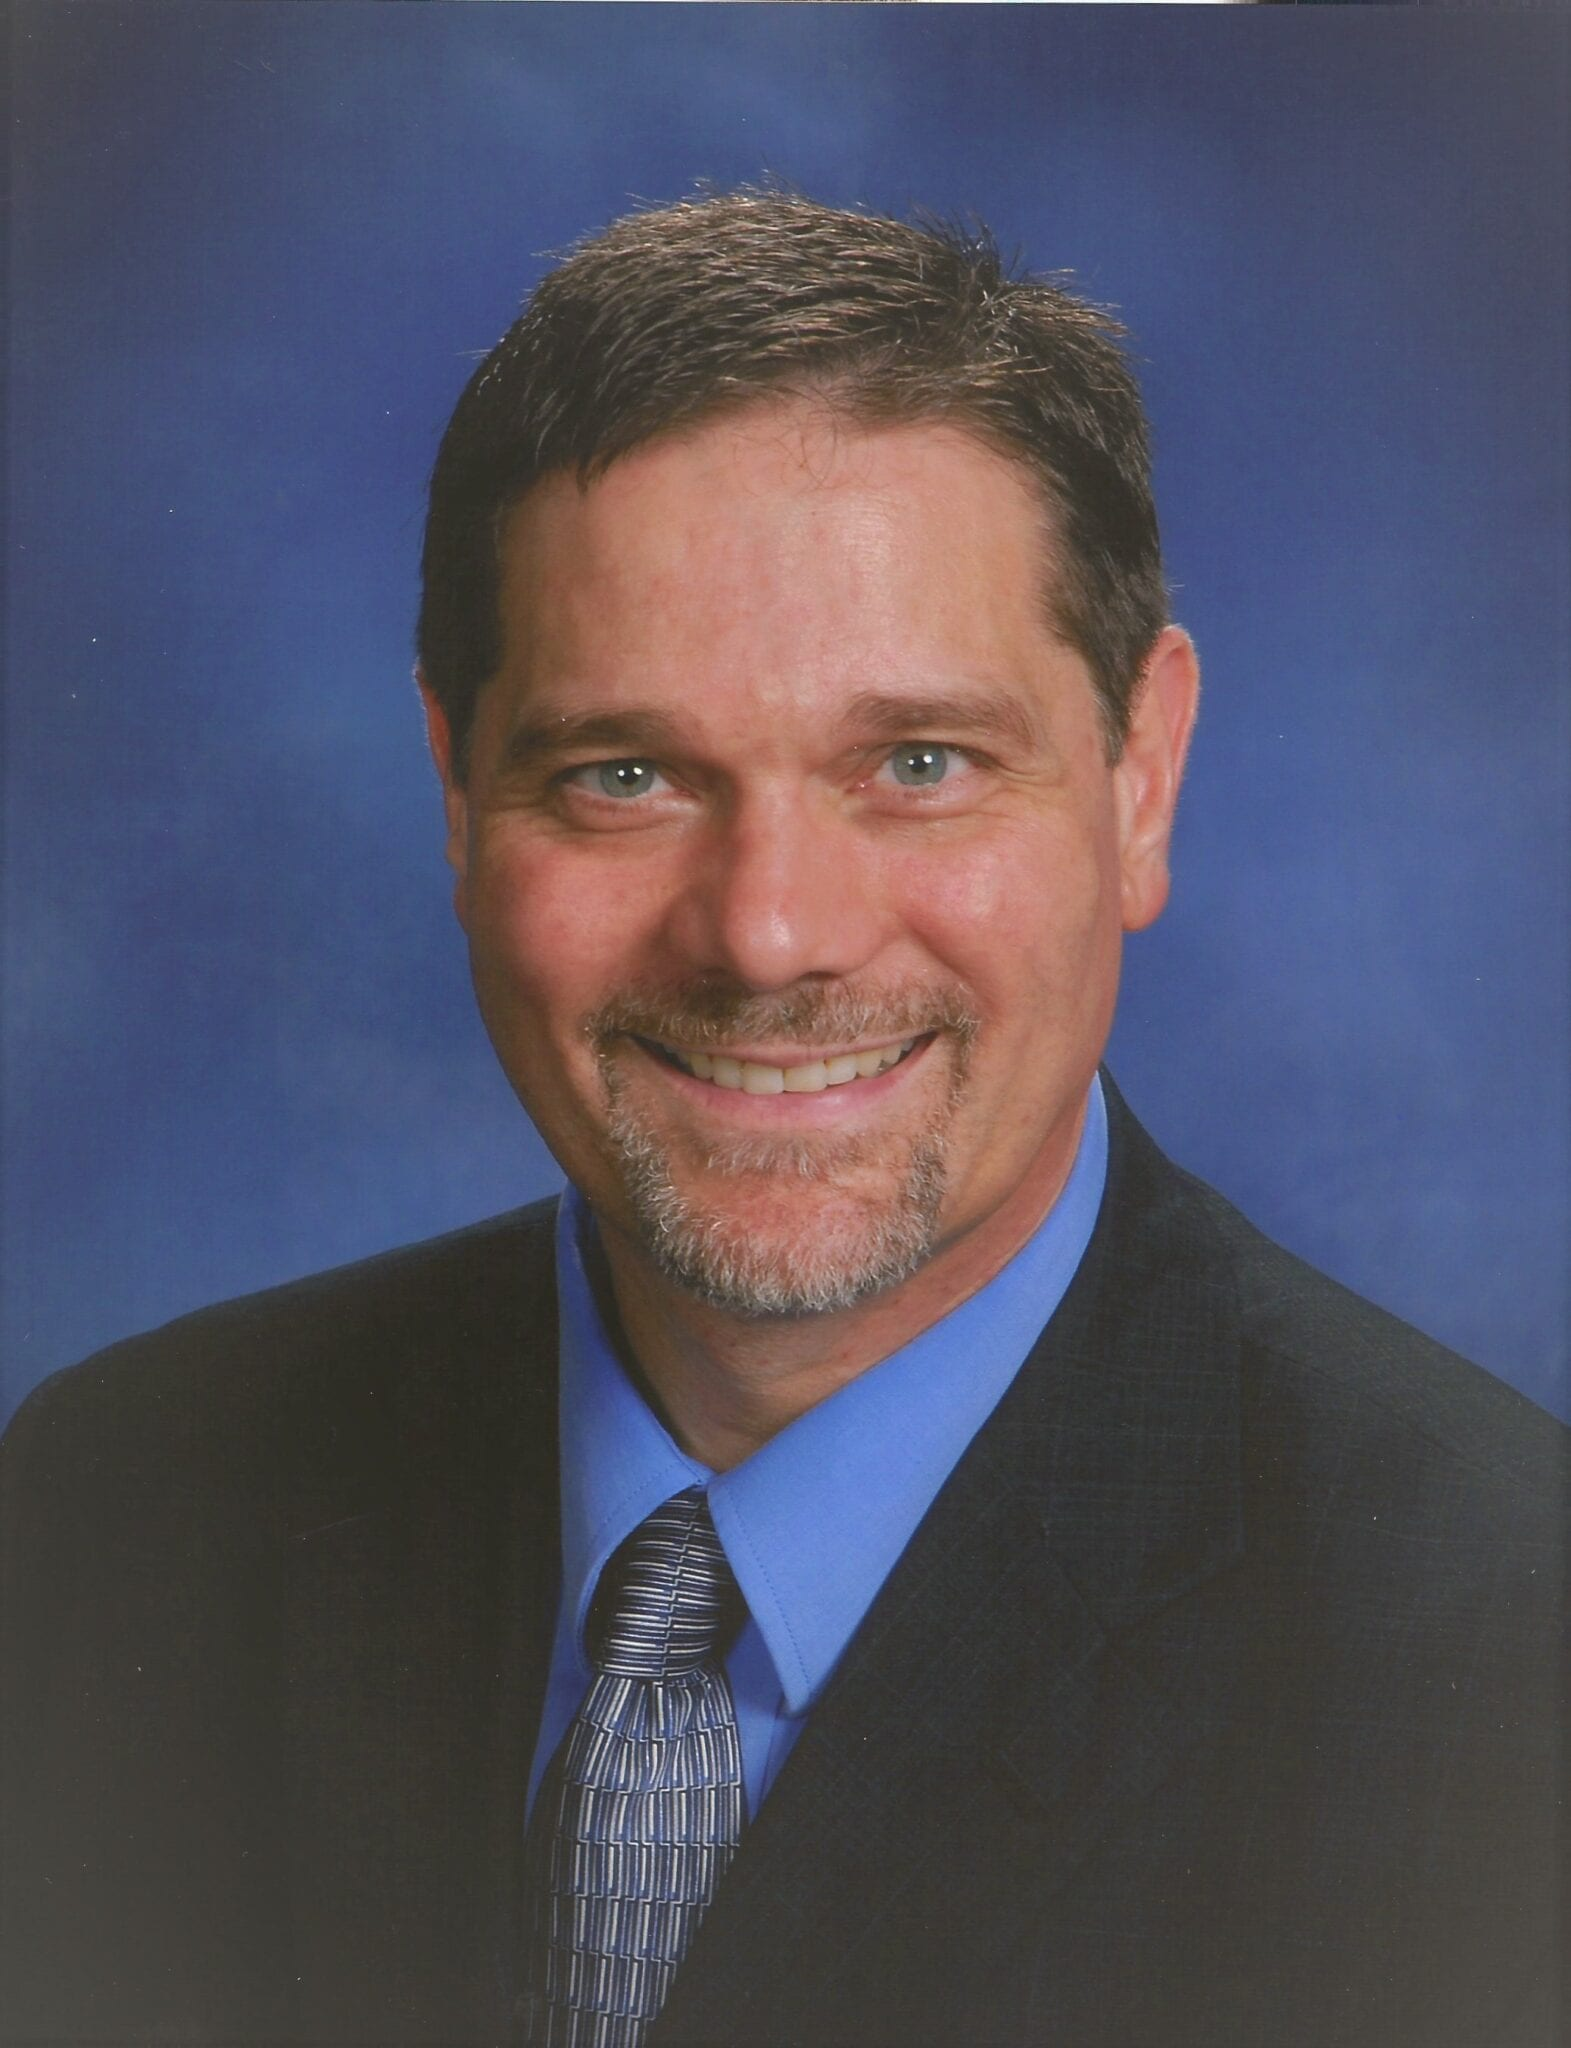 Rev. Greg Tolle